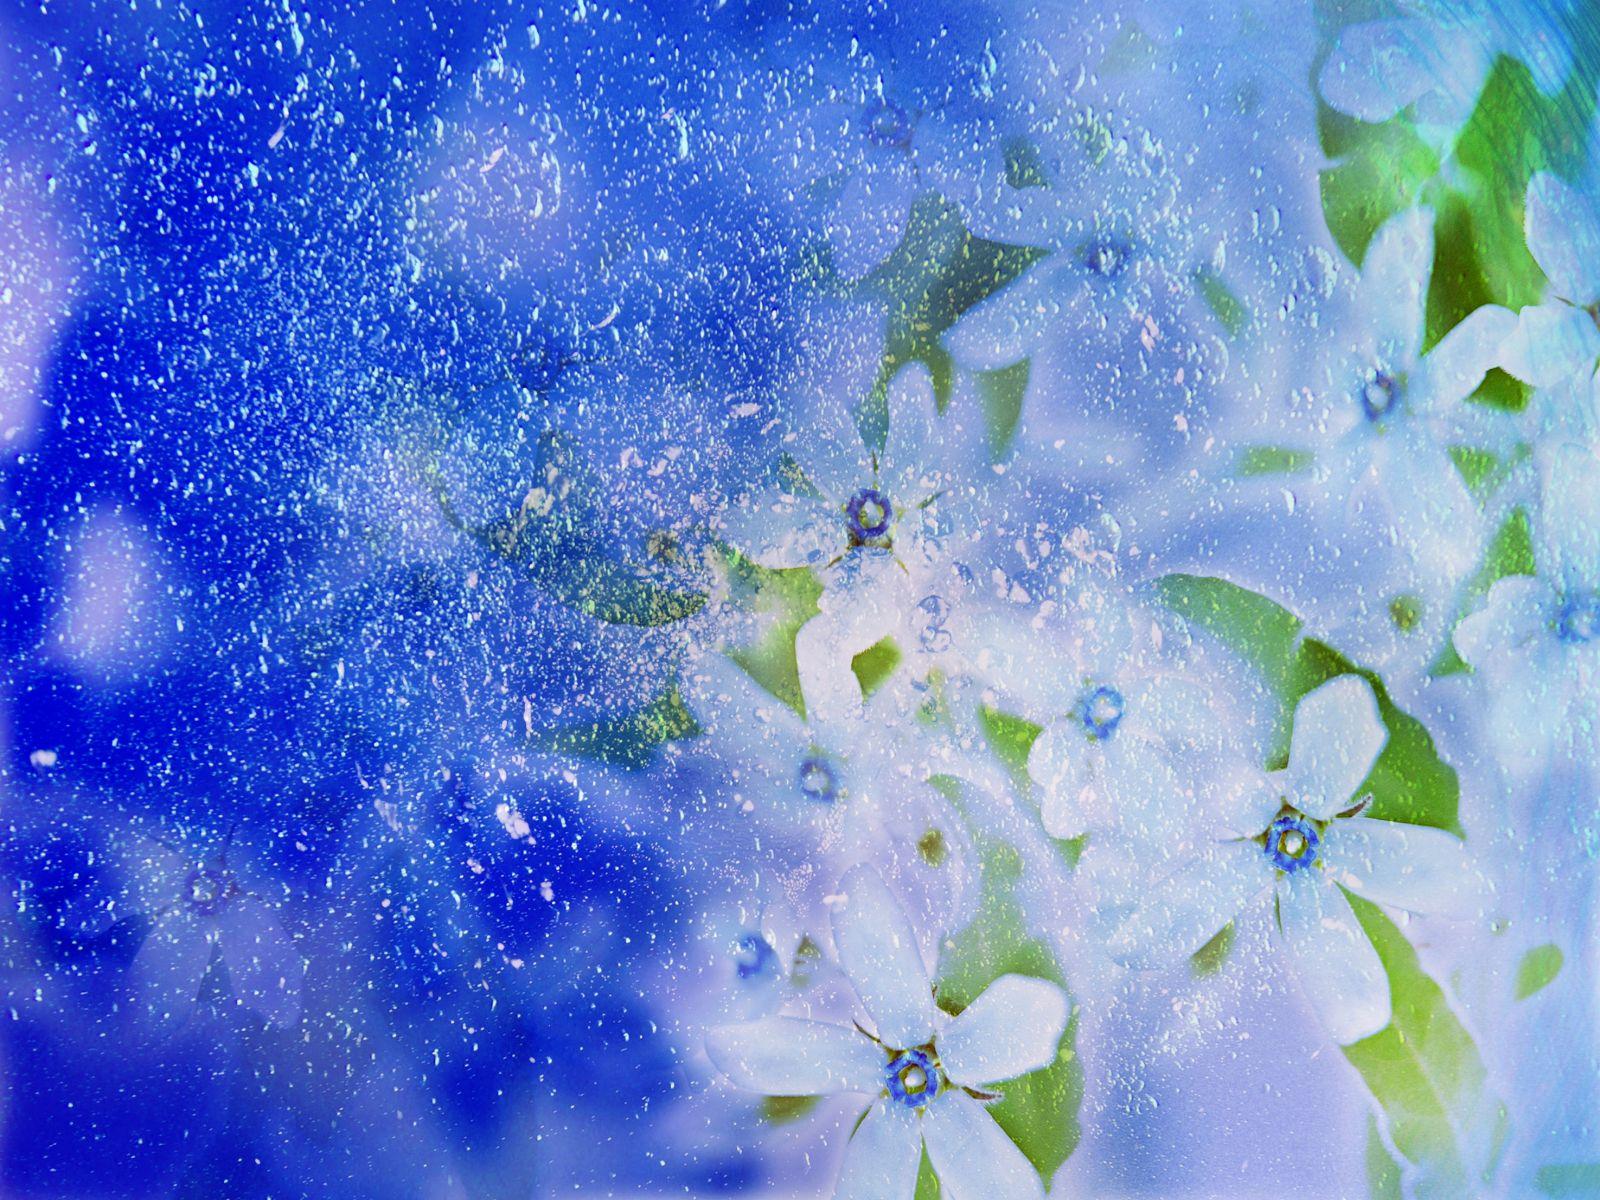 flower wallpaper flower wallpaper for desktop 3d flower wallpaper 1600x1200